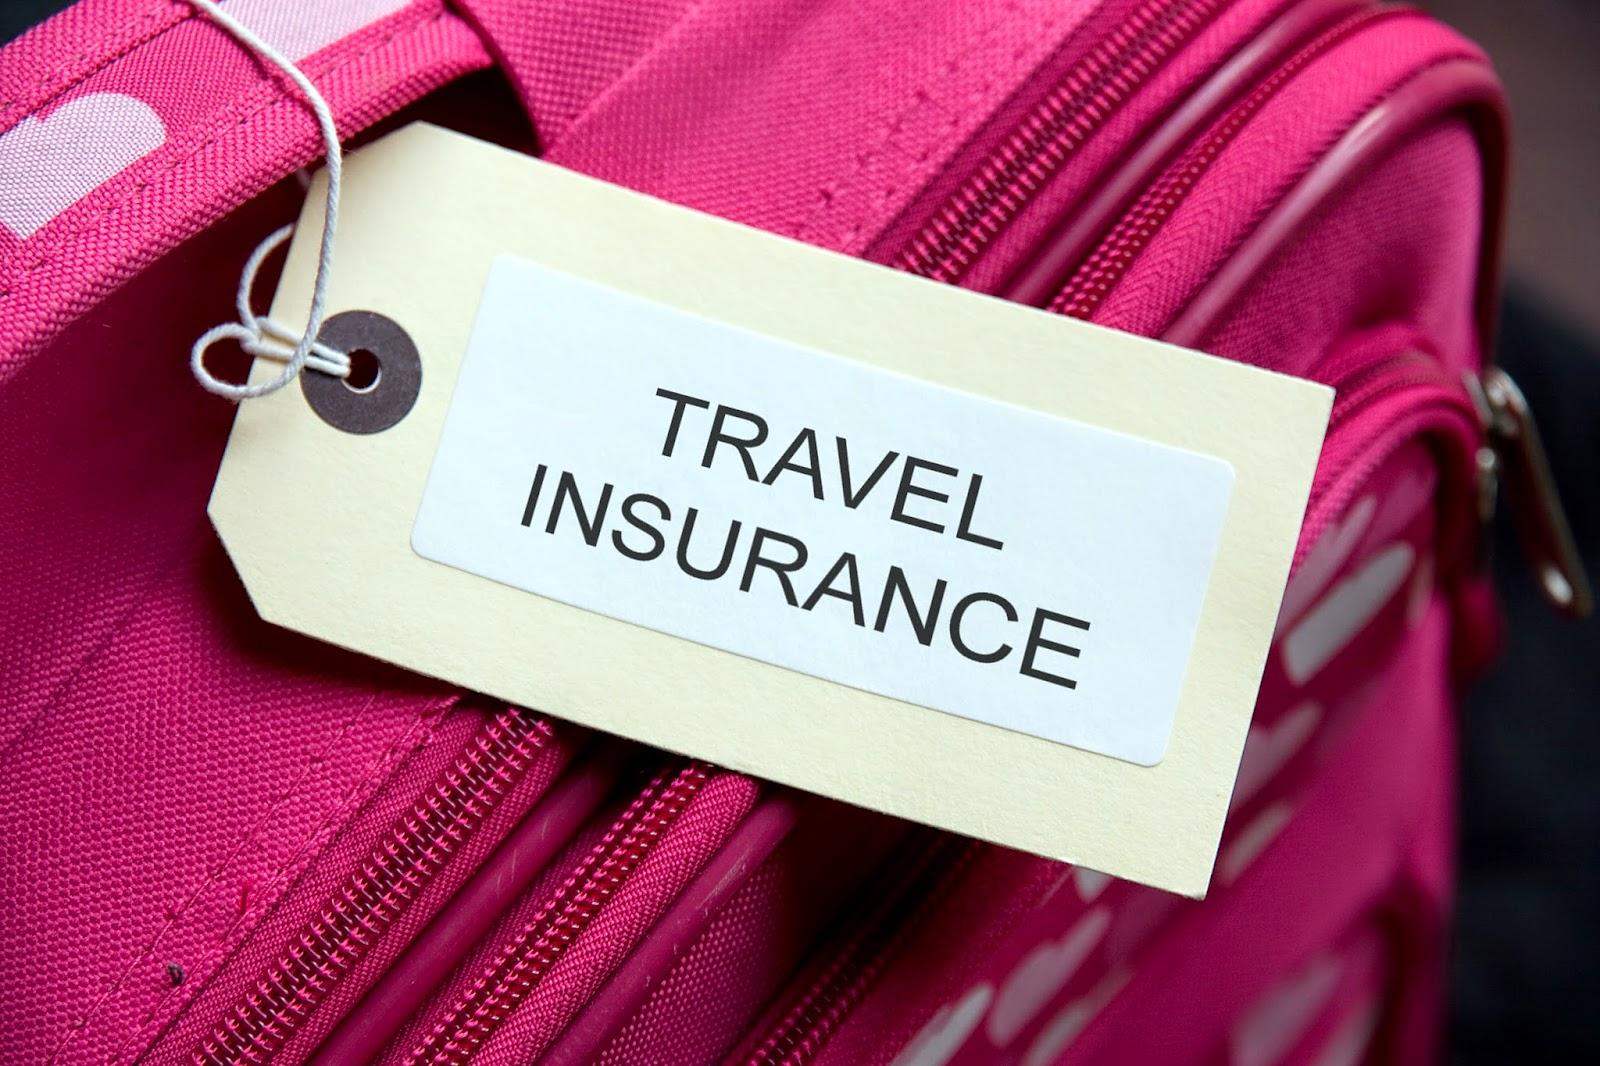 asuransi perjalanan cekpremi